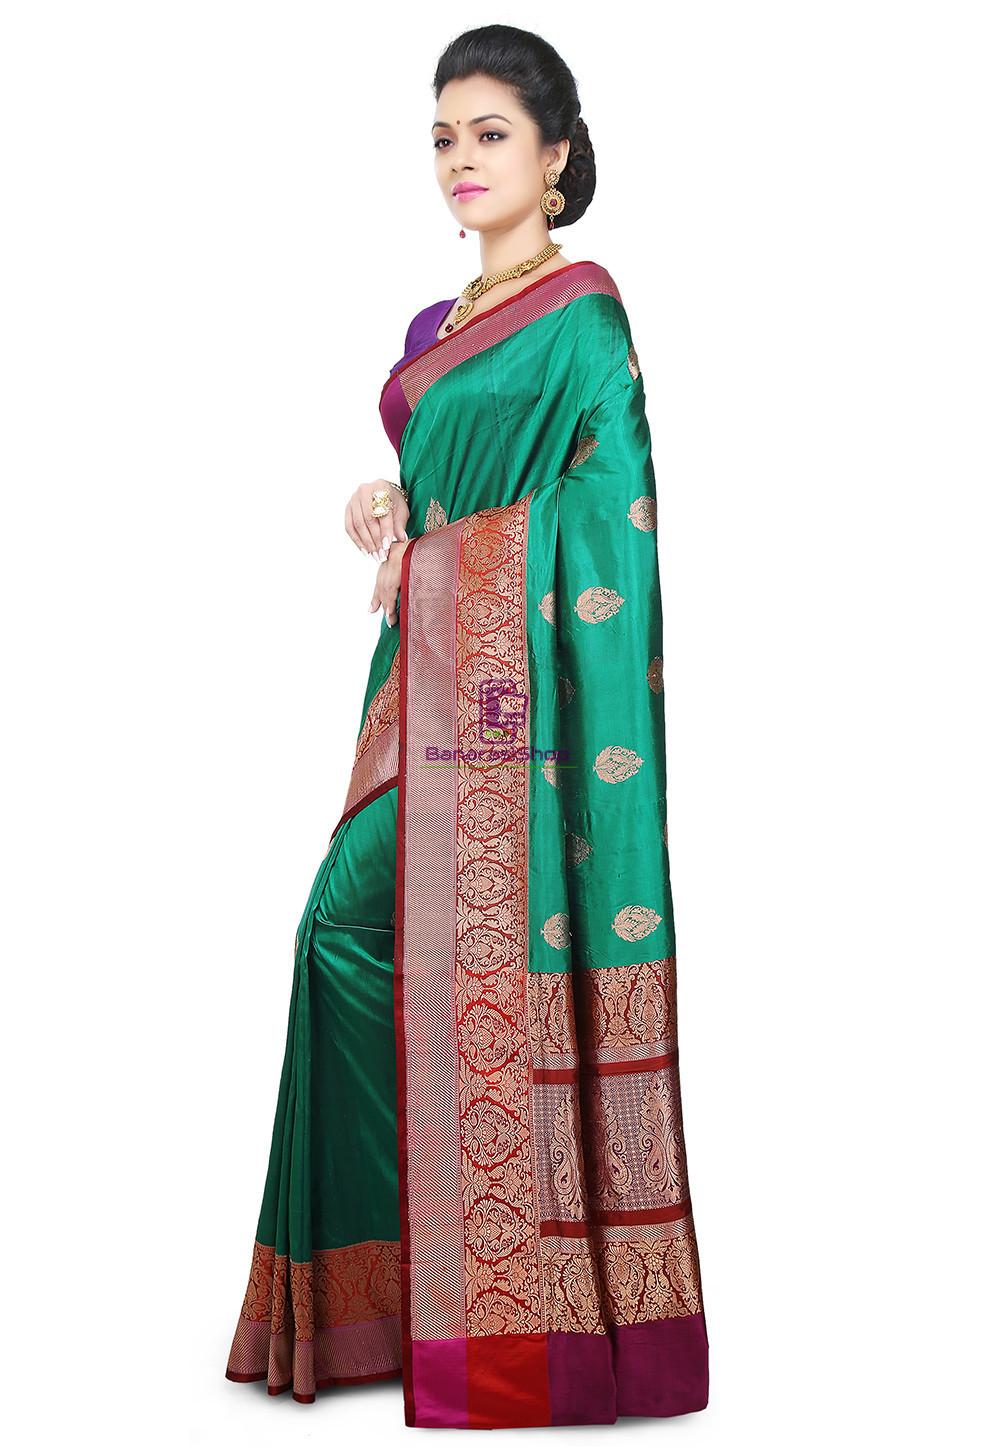 Banarasi Pure Katan Silk Handloom Saree in Teal Green 5